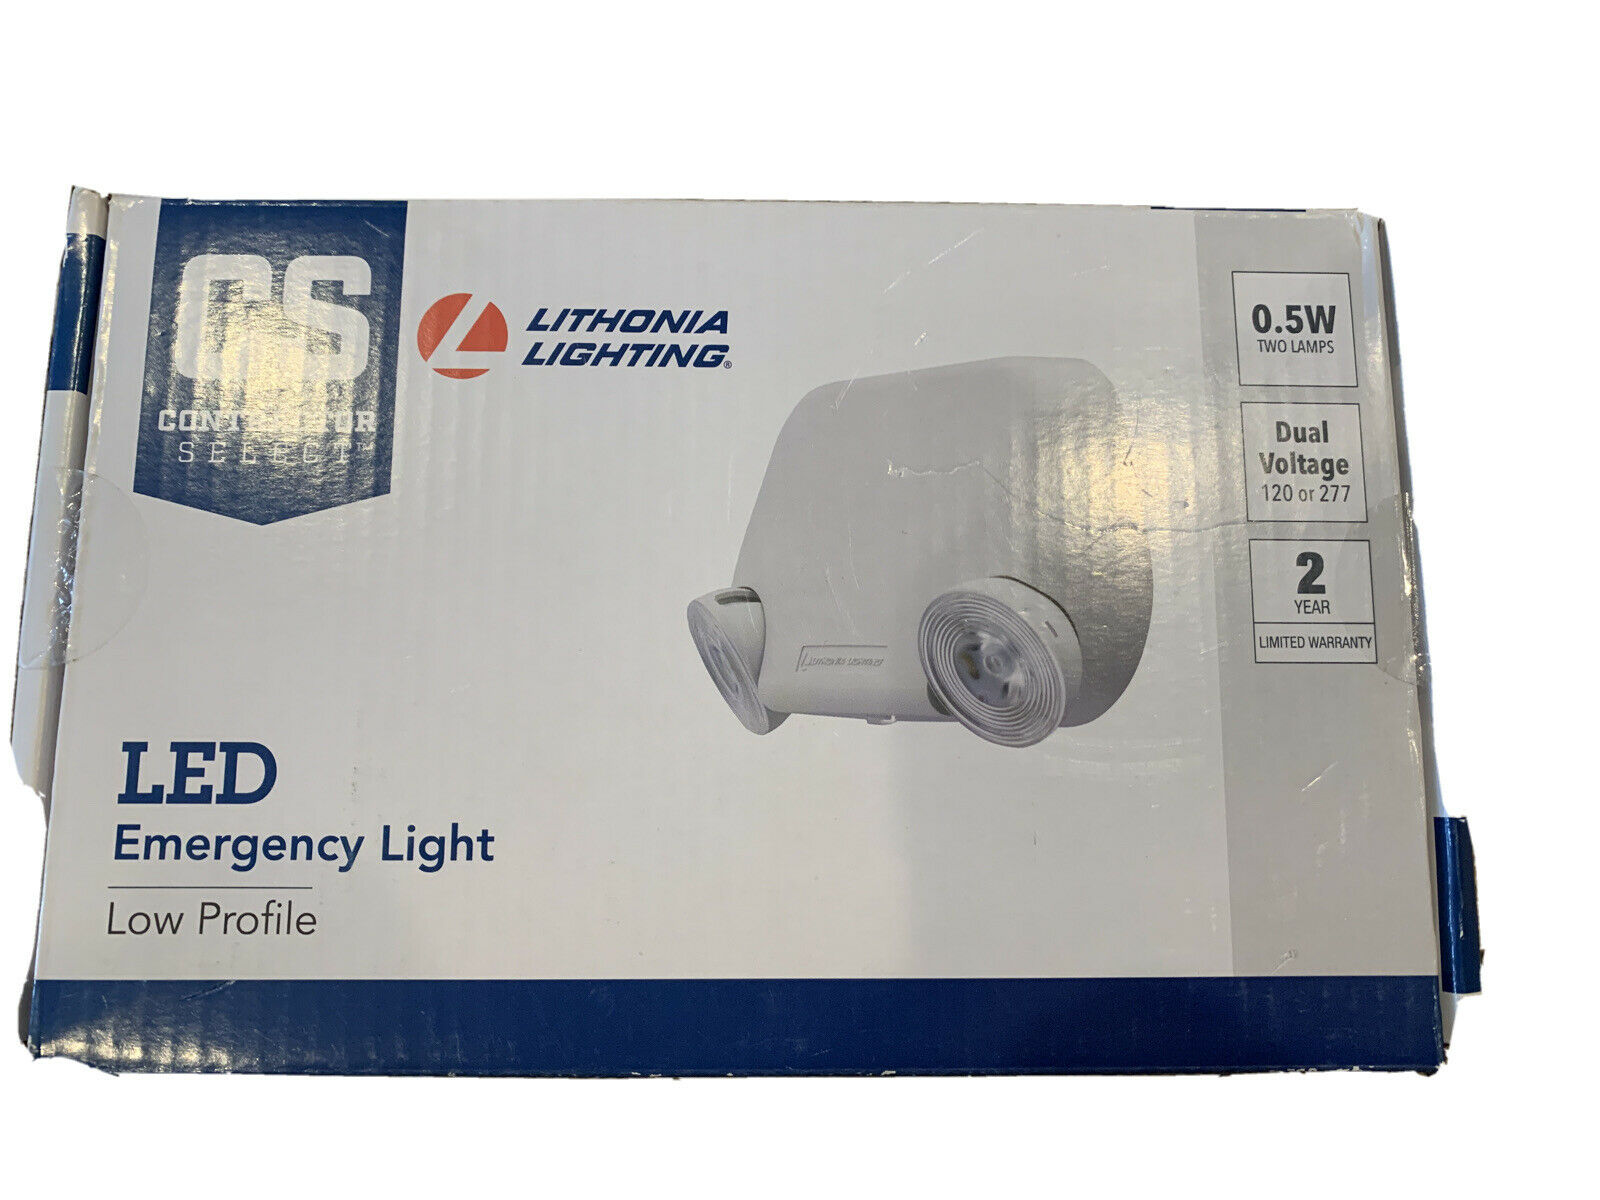 Lithonia Lighting Eu2l M12 Led Emergency Light Two Lamps Profile For Sale Online Ebay